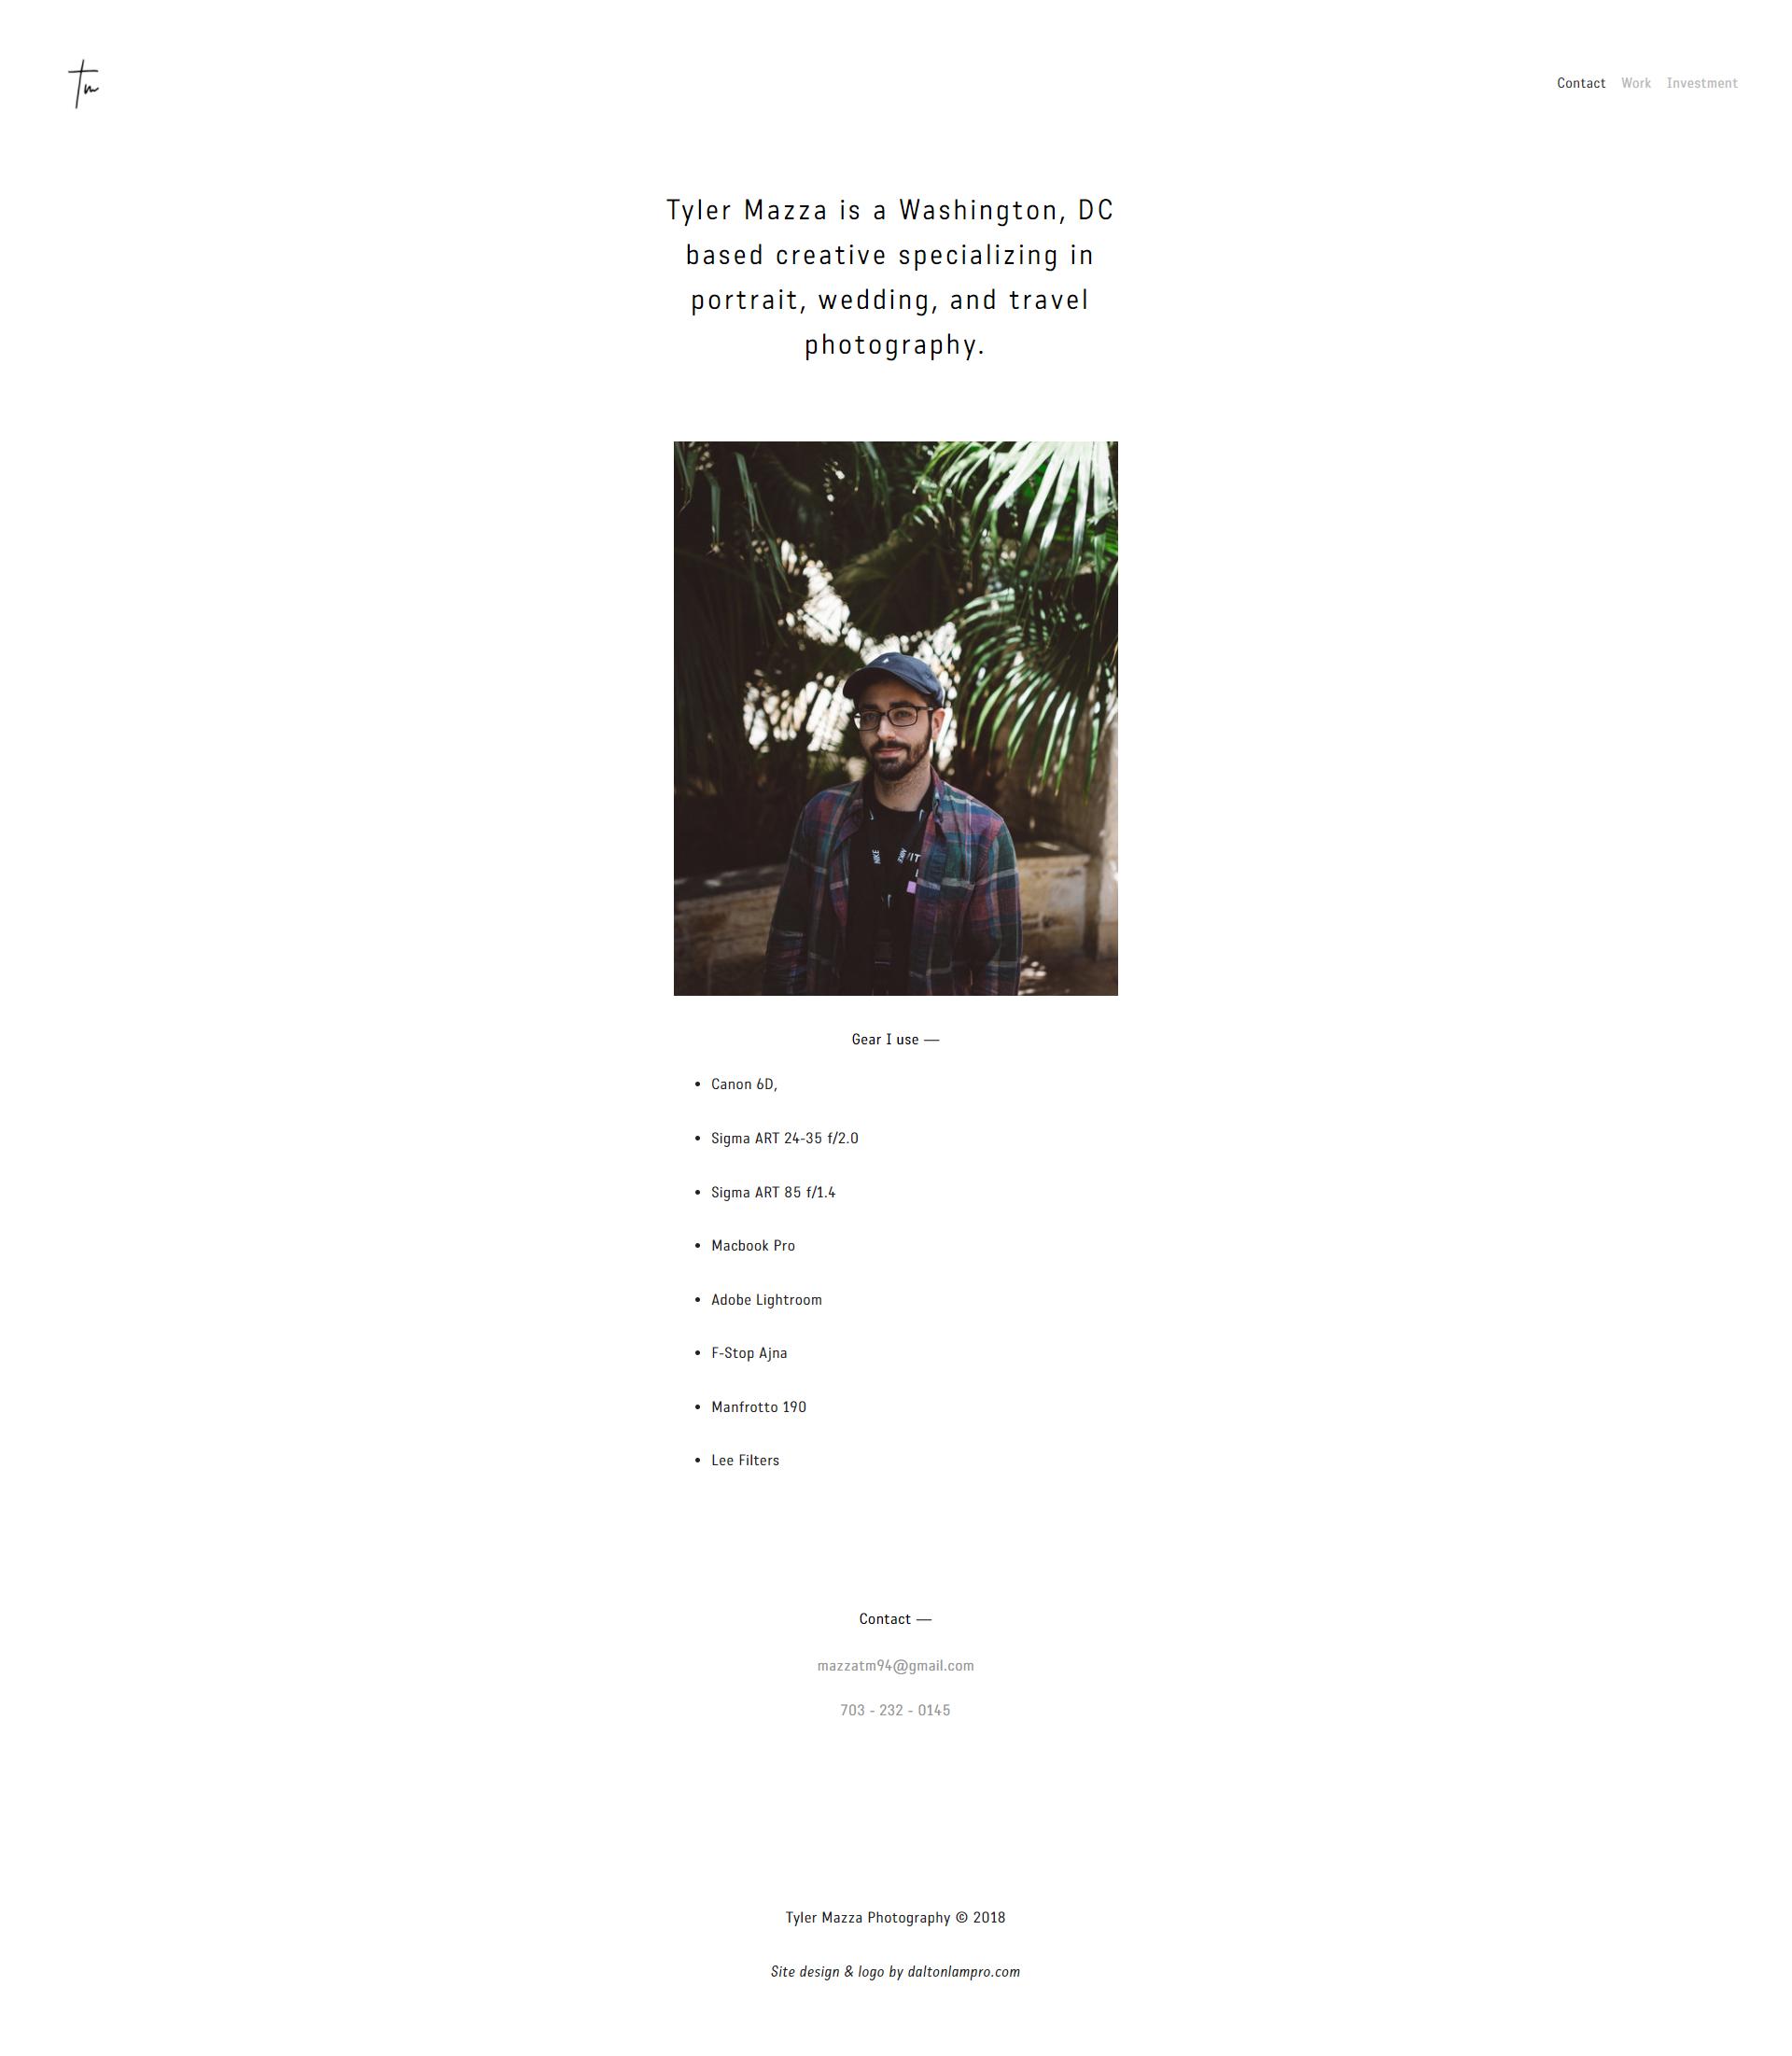 screencapture-tylermazza-contact-2018-05-02-17_52_07.png